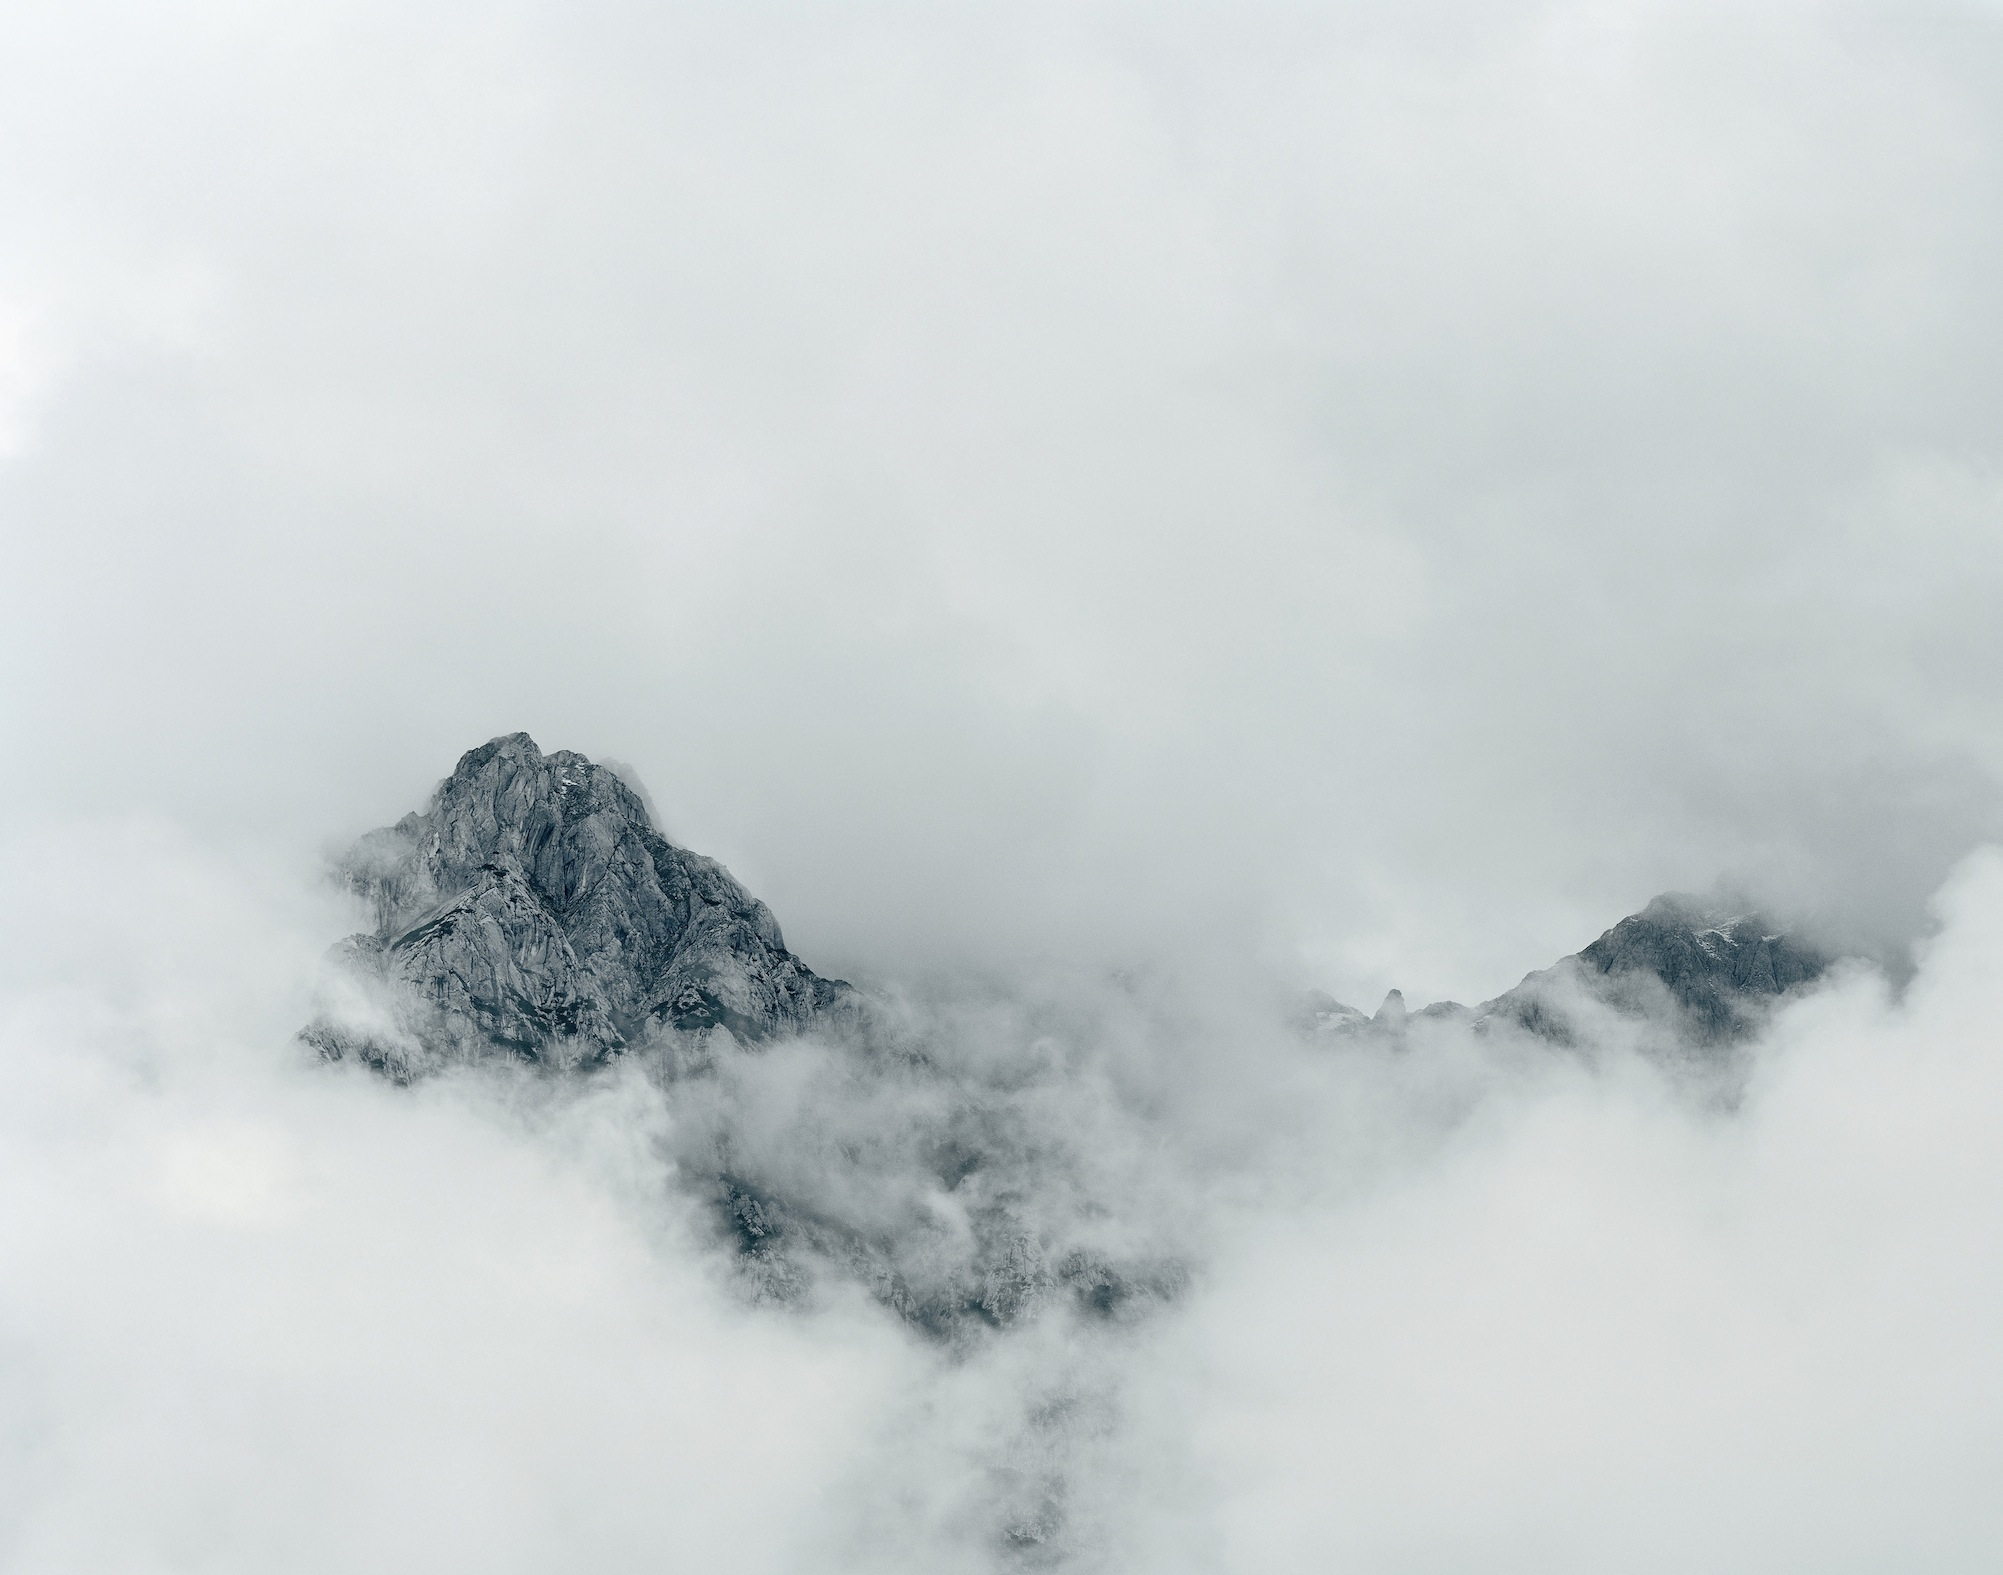 Axel Hütte, Raucheck, Austria dalla serie New Mountains, 2011, 135x165 cm, Ditone Print © l'artista